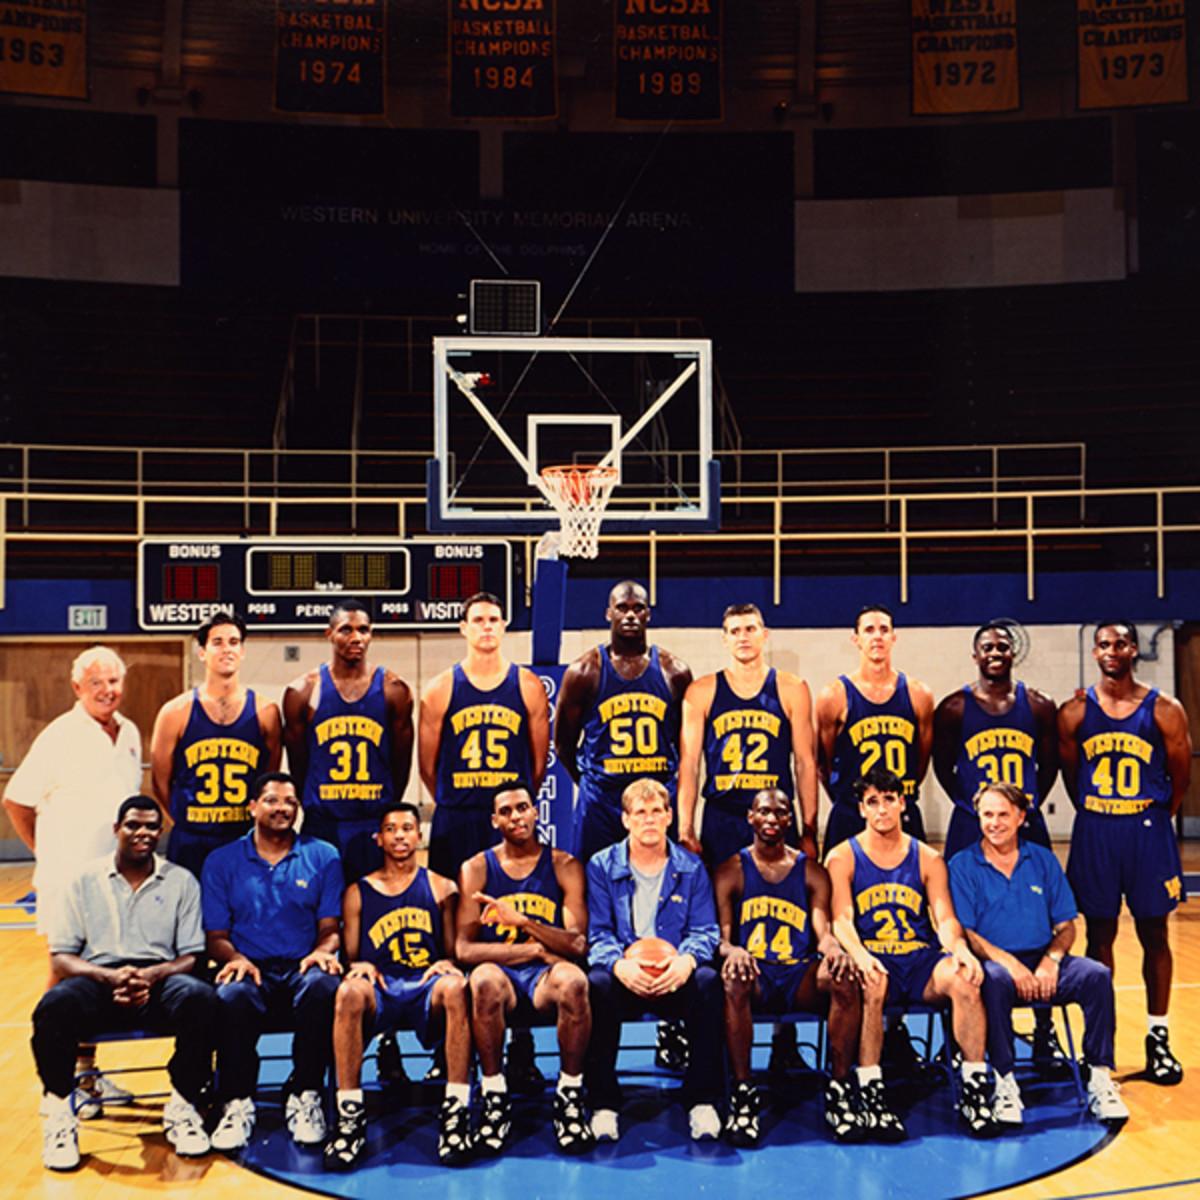 blue-chips-stills-team-photo.jpg